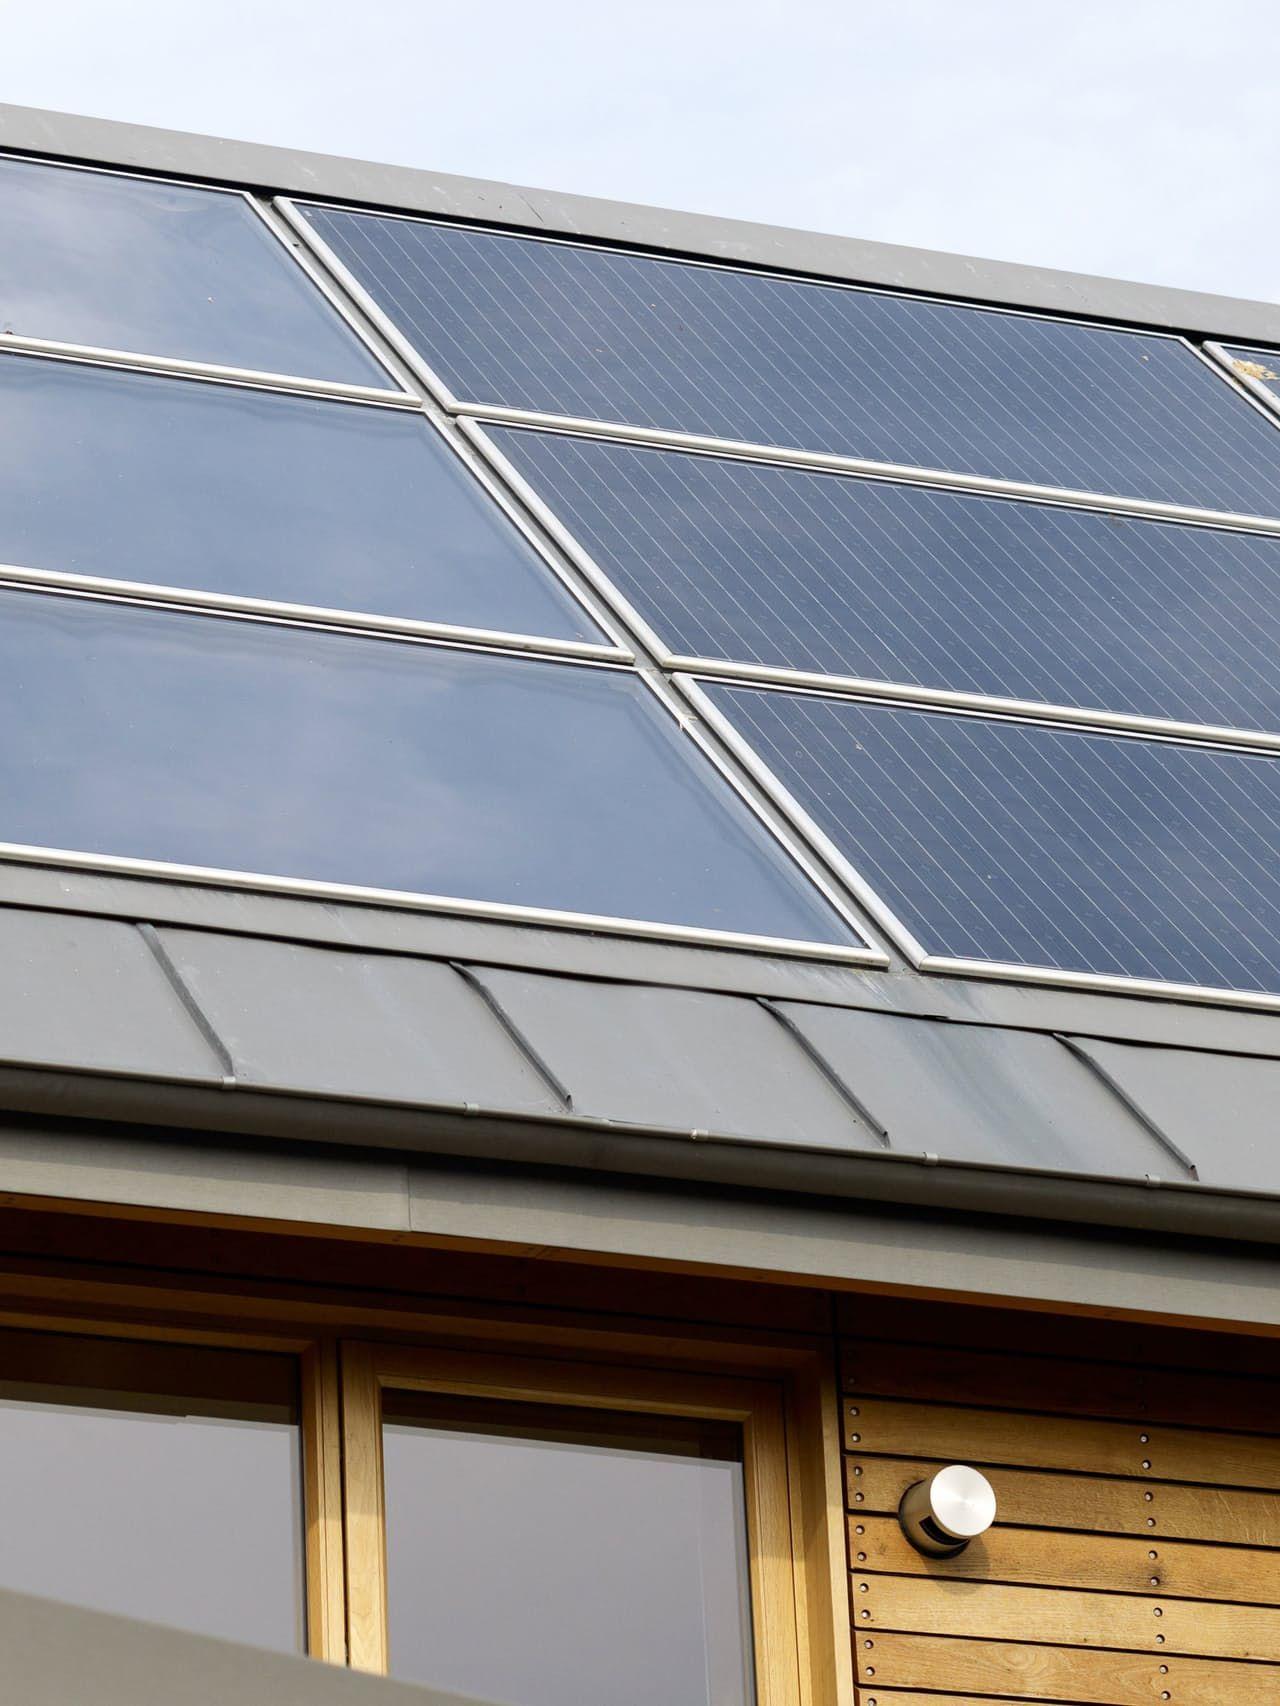 Mark S Zero Carbon English Eco House In 2020 Solar Eco House Solar Panels